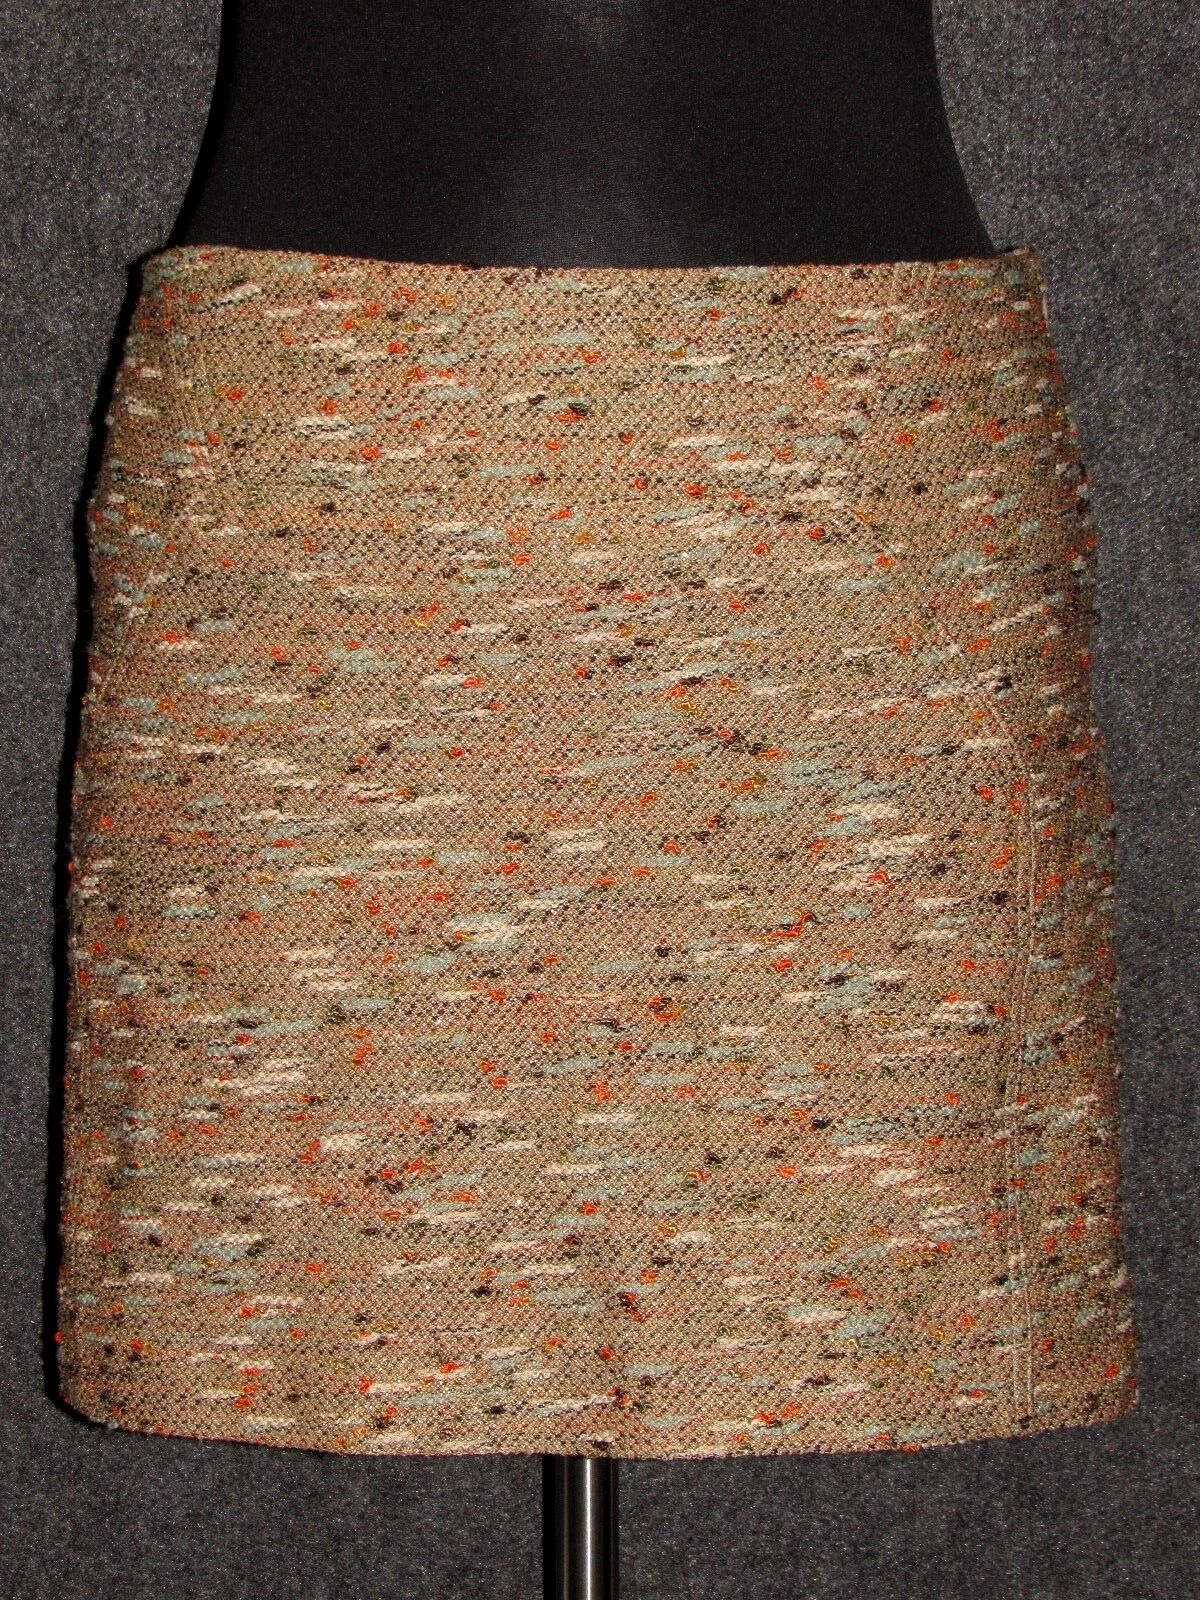 DIANE VON FURSTENBERG colorful Woven Tweed Mini Skirt SZ 12 NEW